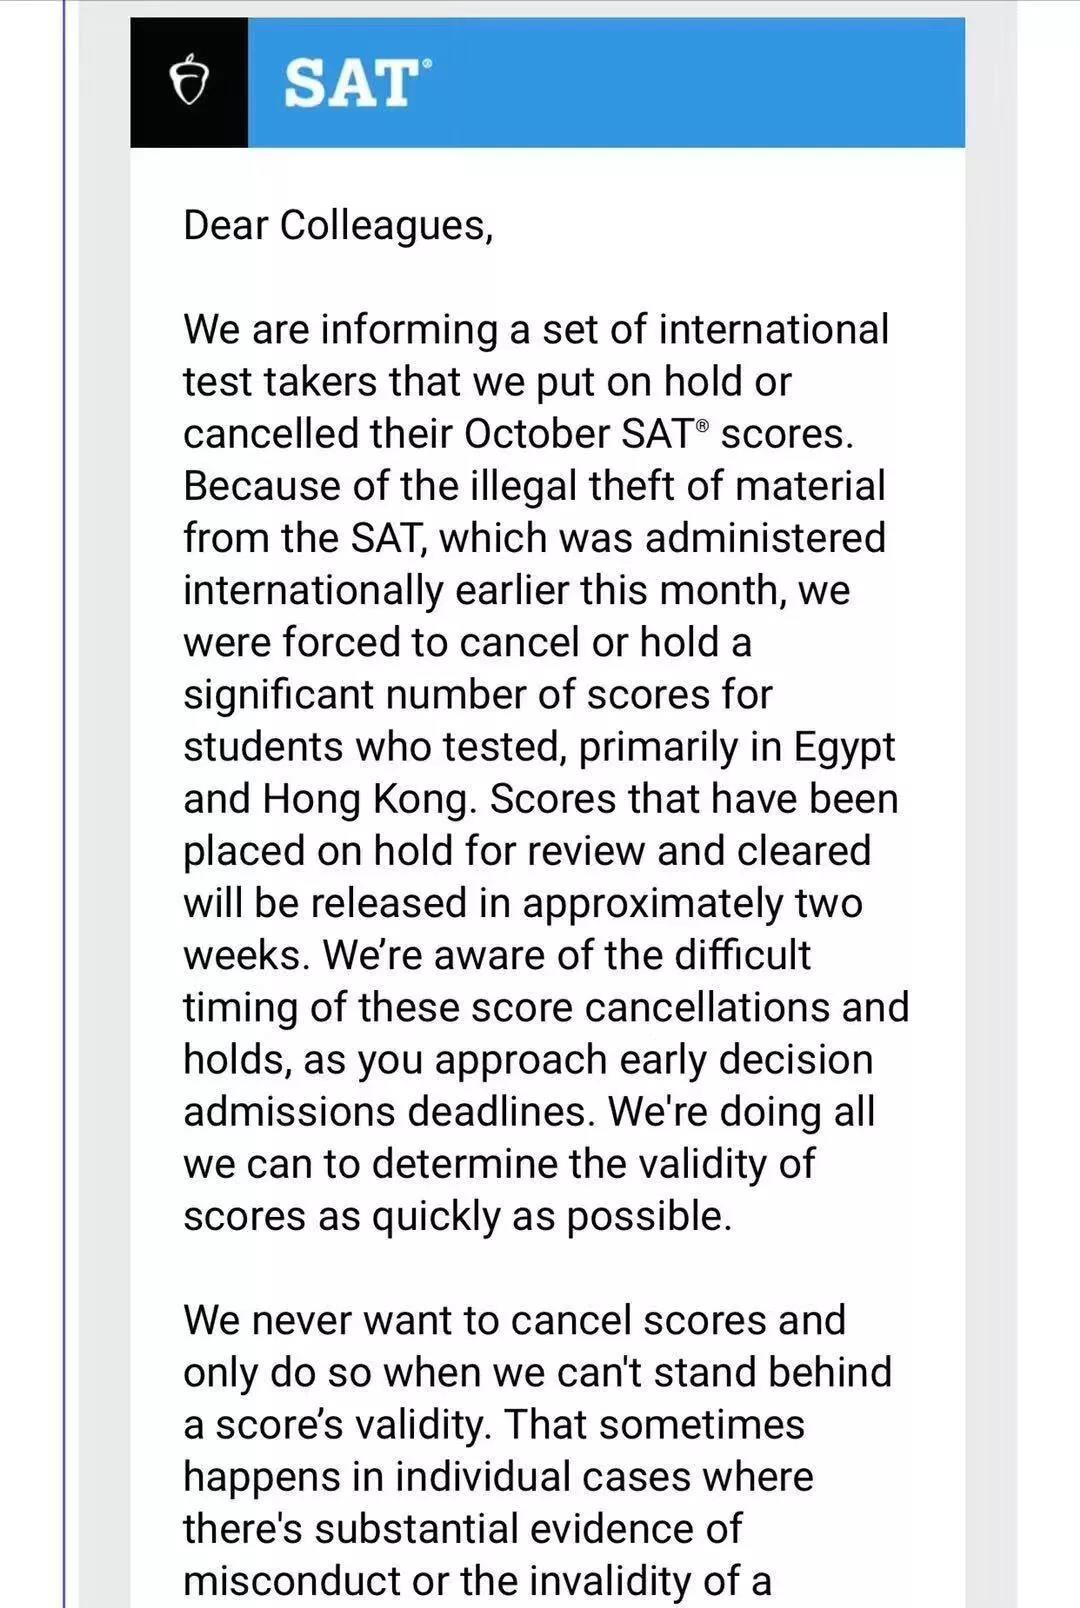 CB取消10月SAT香港考场成绩?别再以讹传讹了!